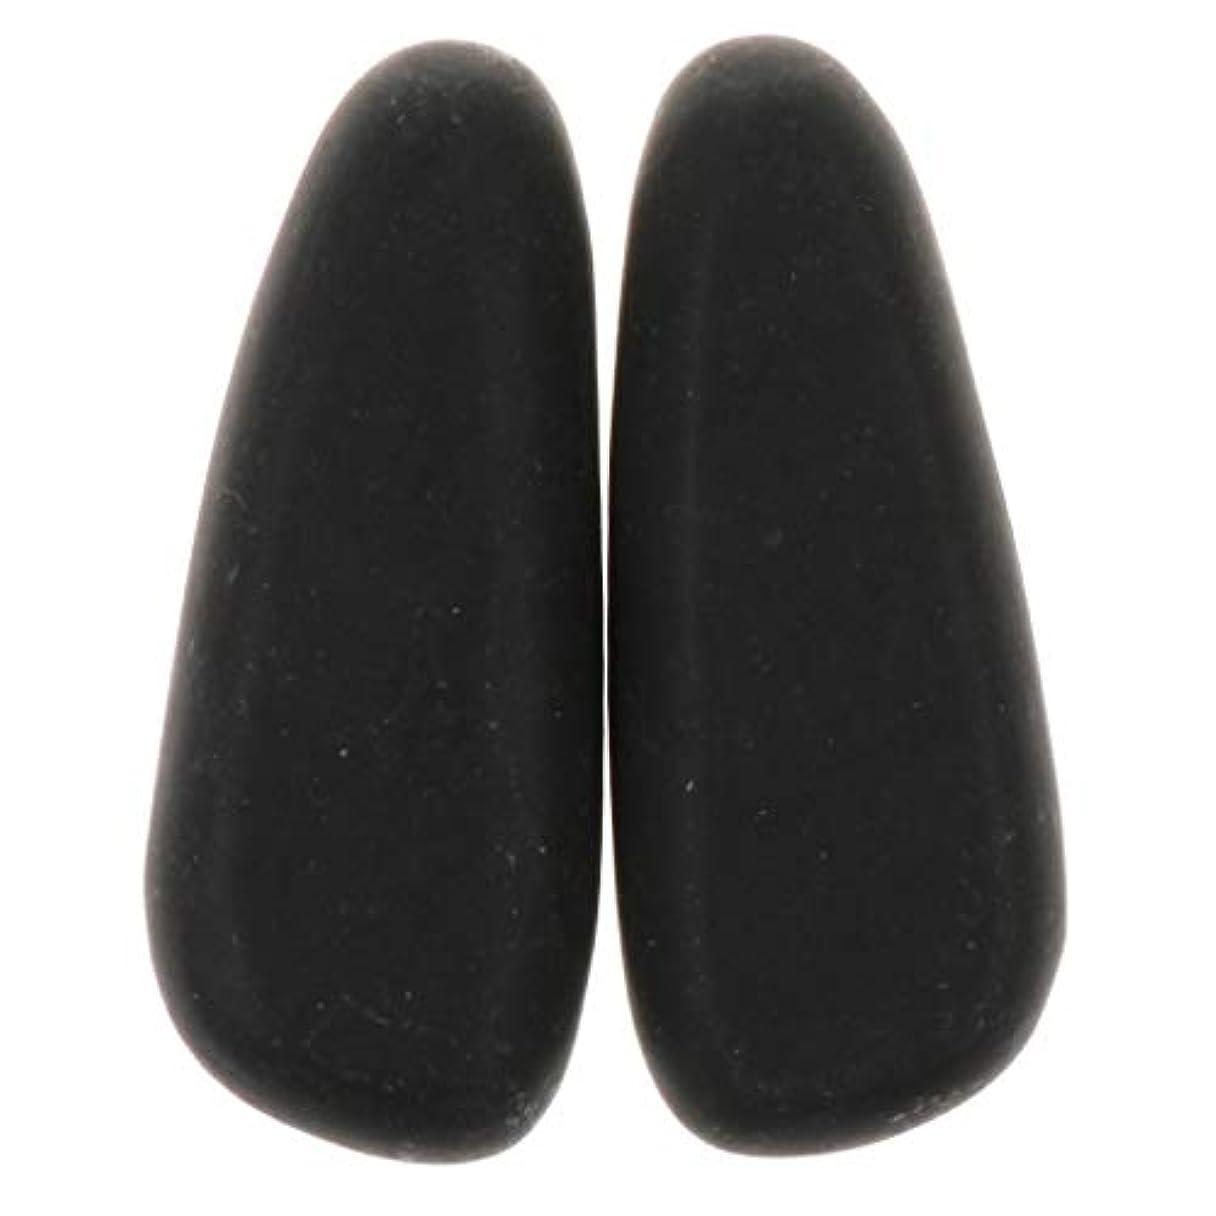 Hellery マッサージストーン 天然石ホットストーン マッサージ用玄武岩 SPA ツボ押しグッズ 2個 全2サイズ - 8×3.2×2cm